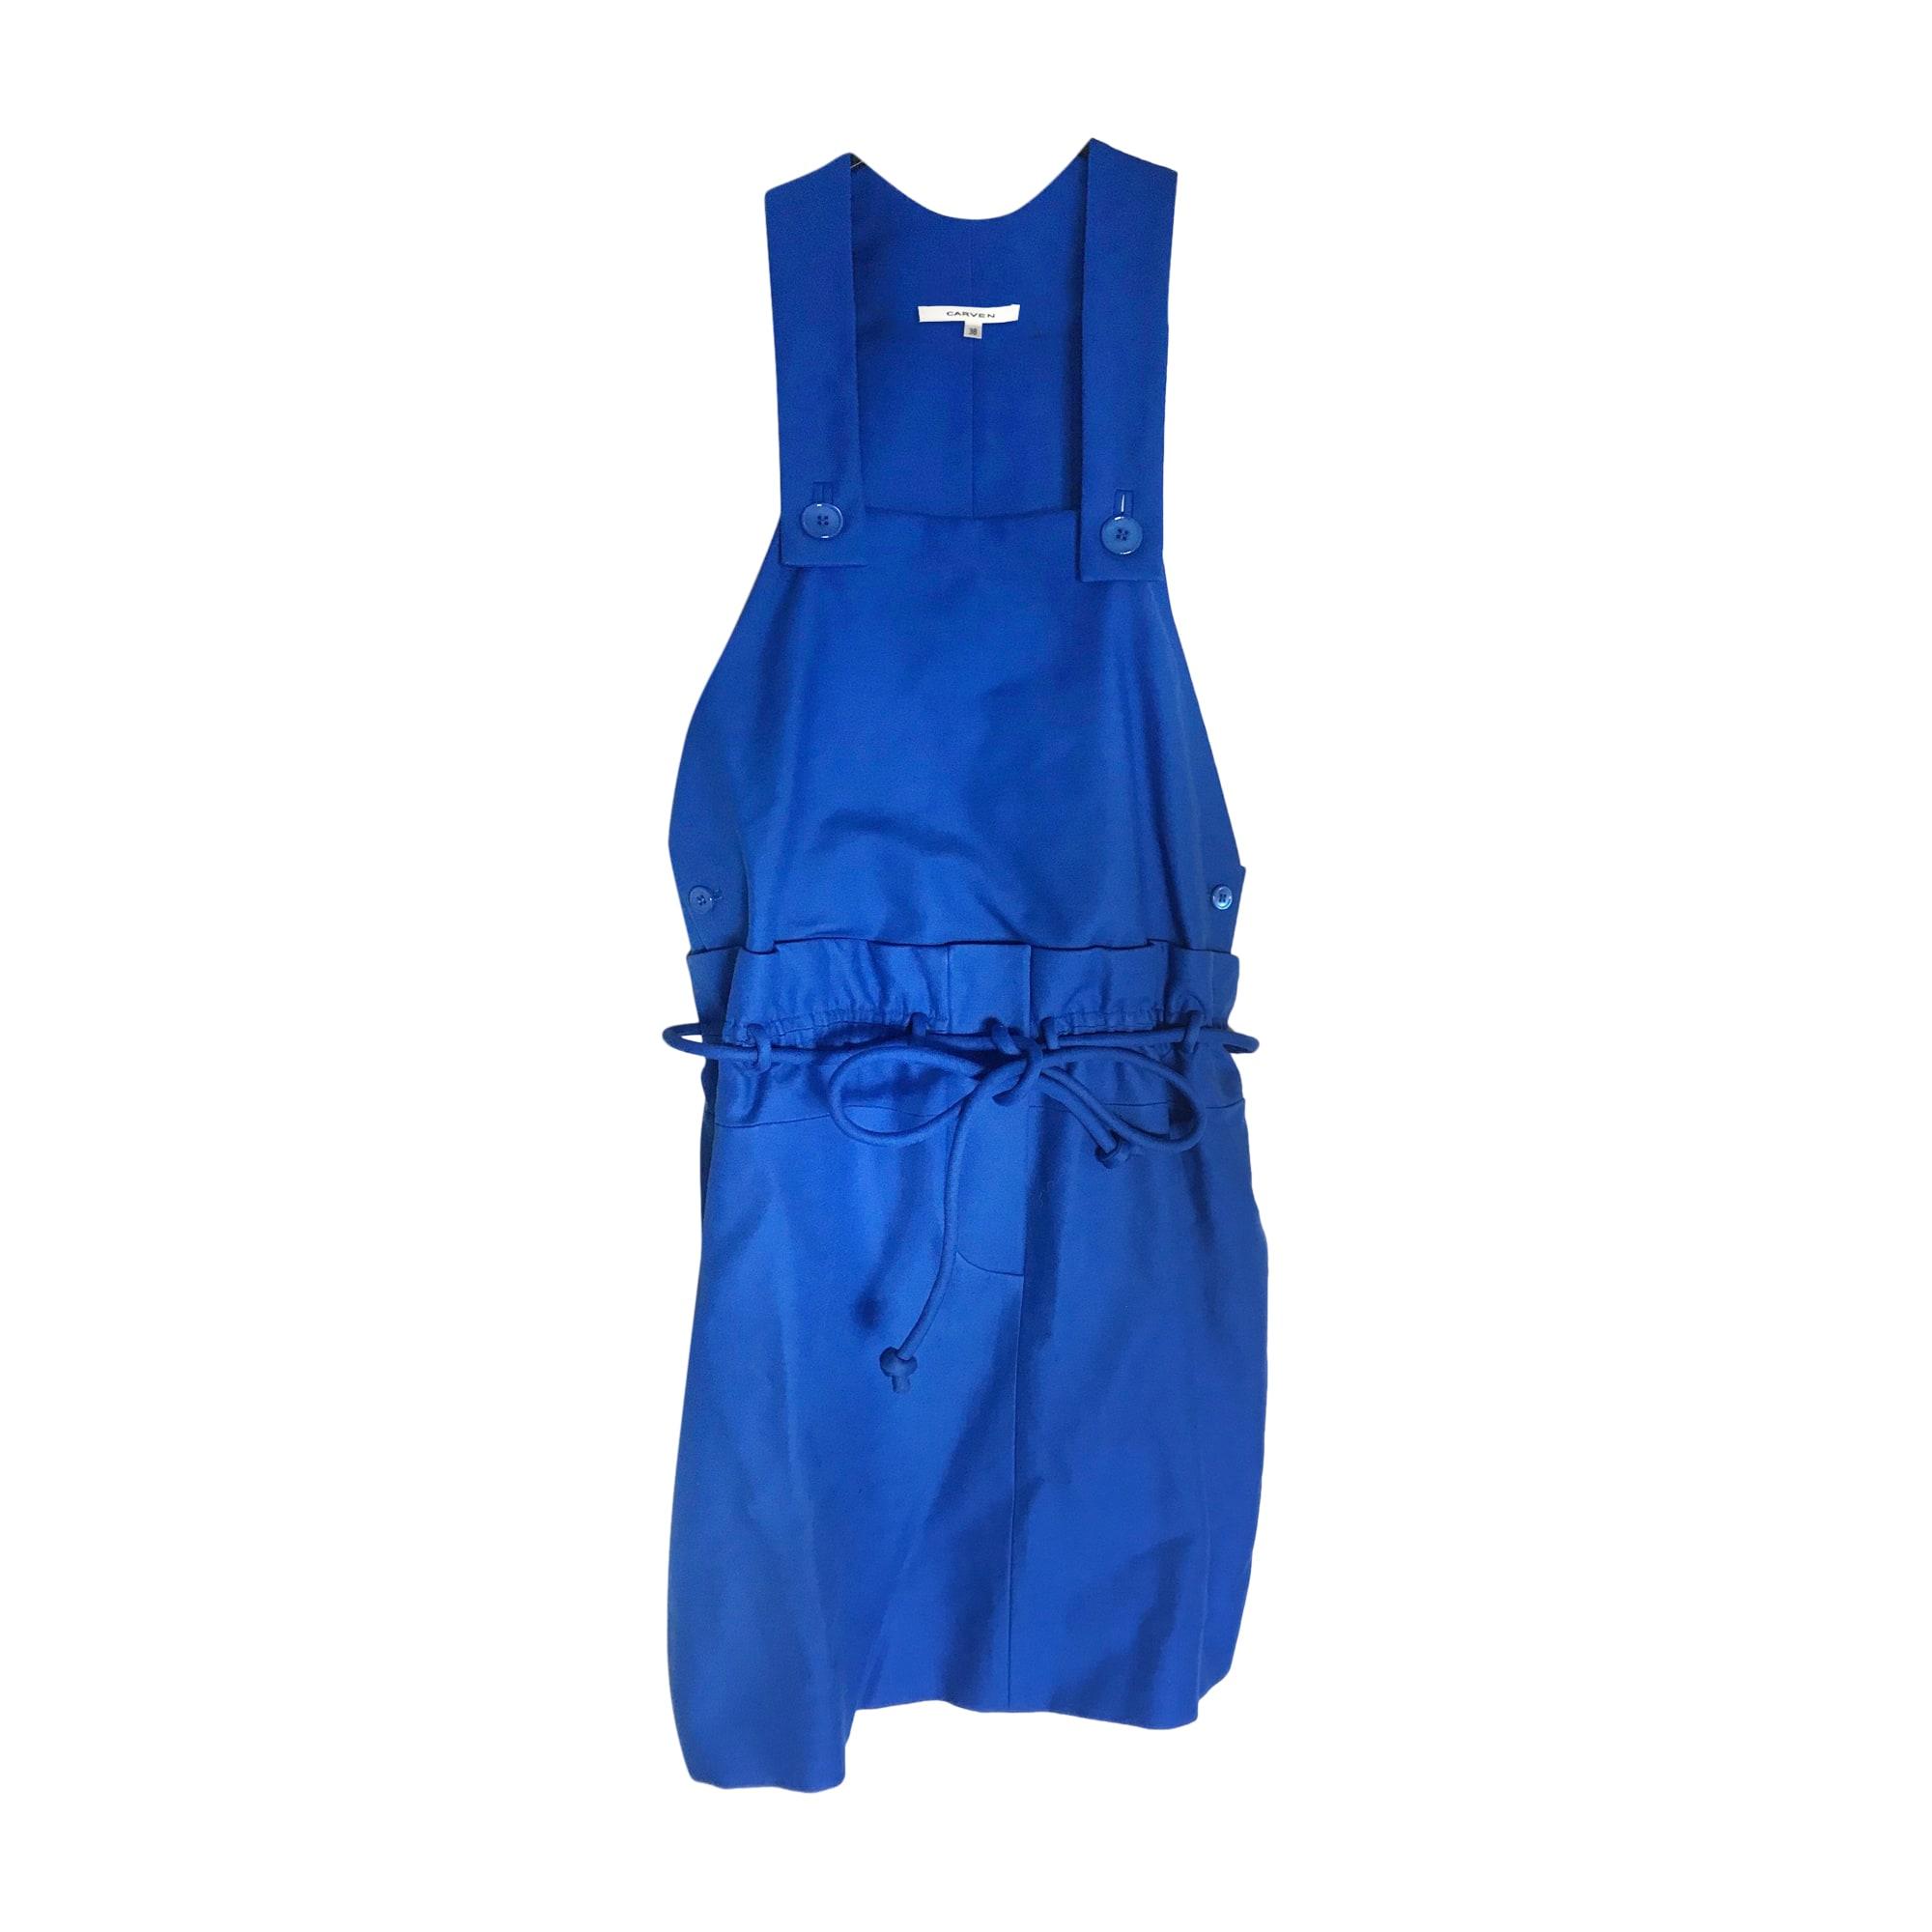 Robe courte CARVEN Bleu, bleu marine, bleu turquoise